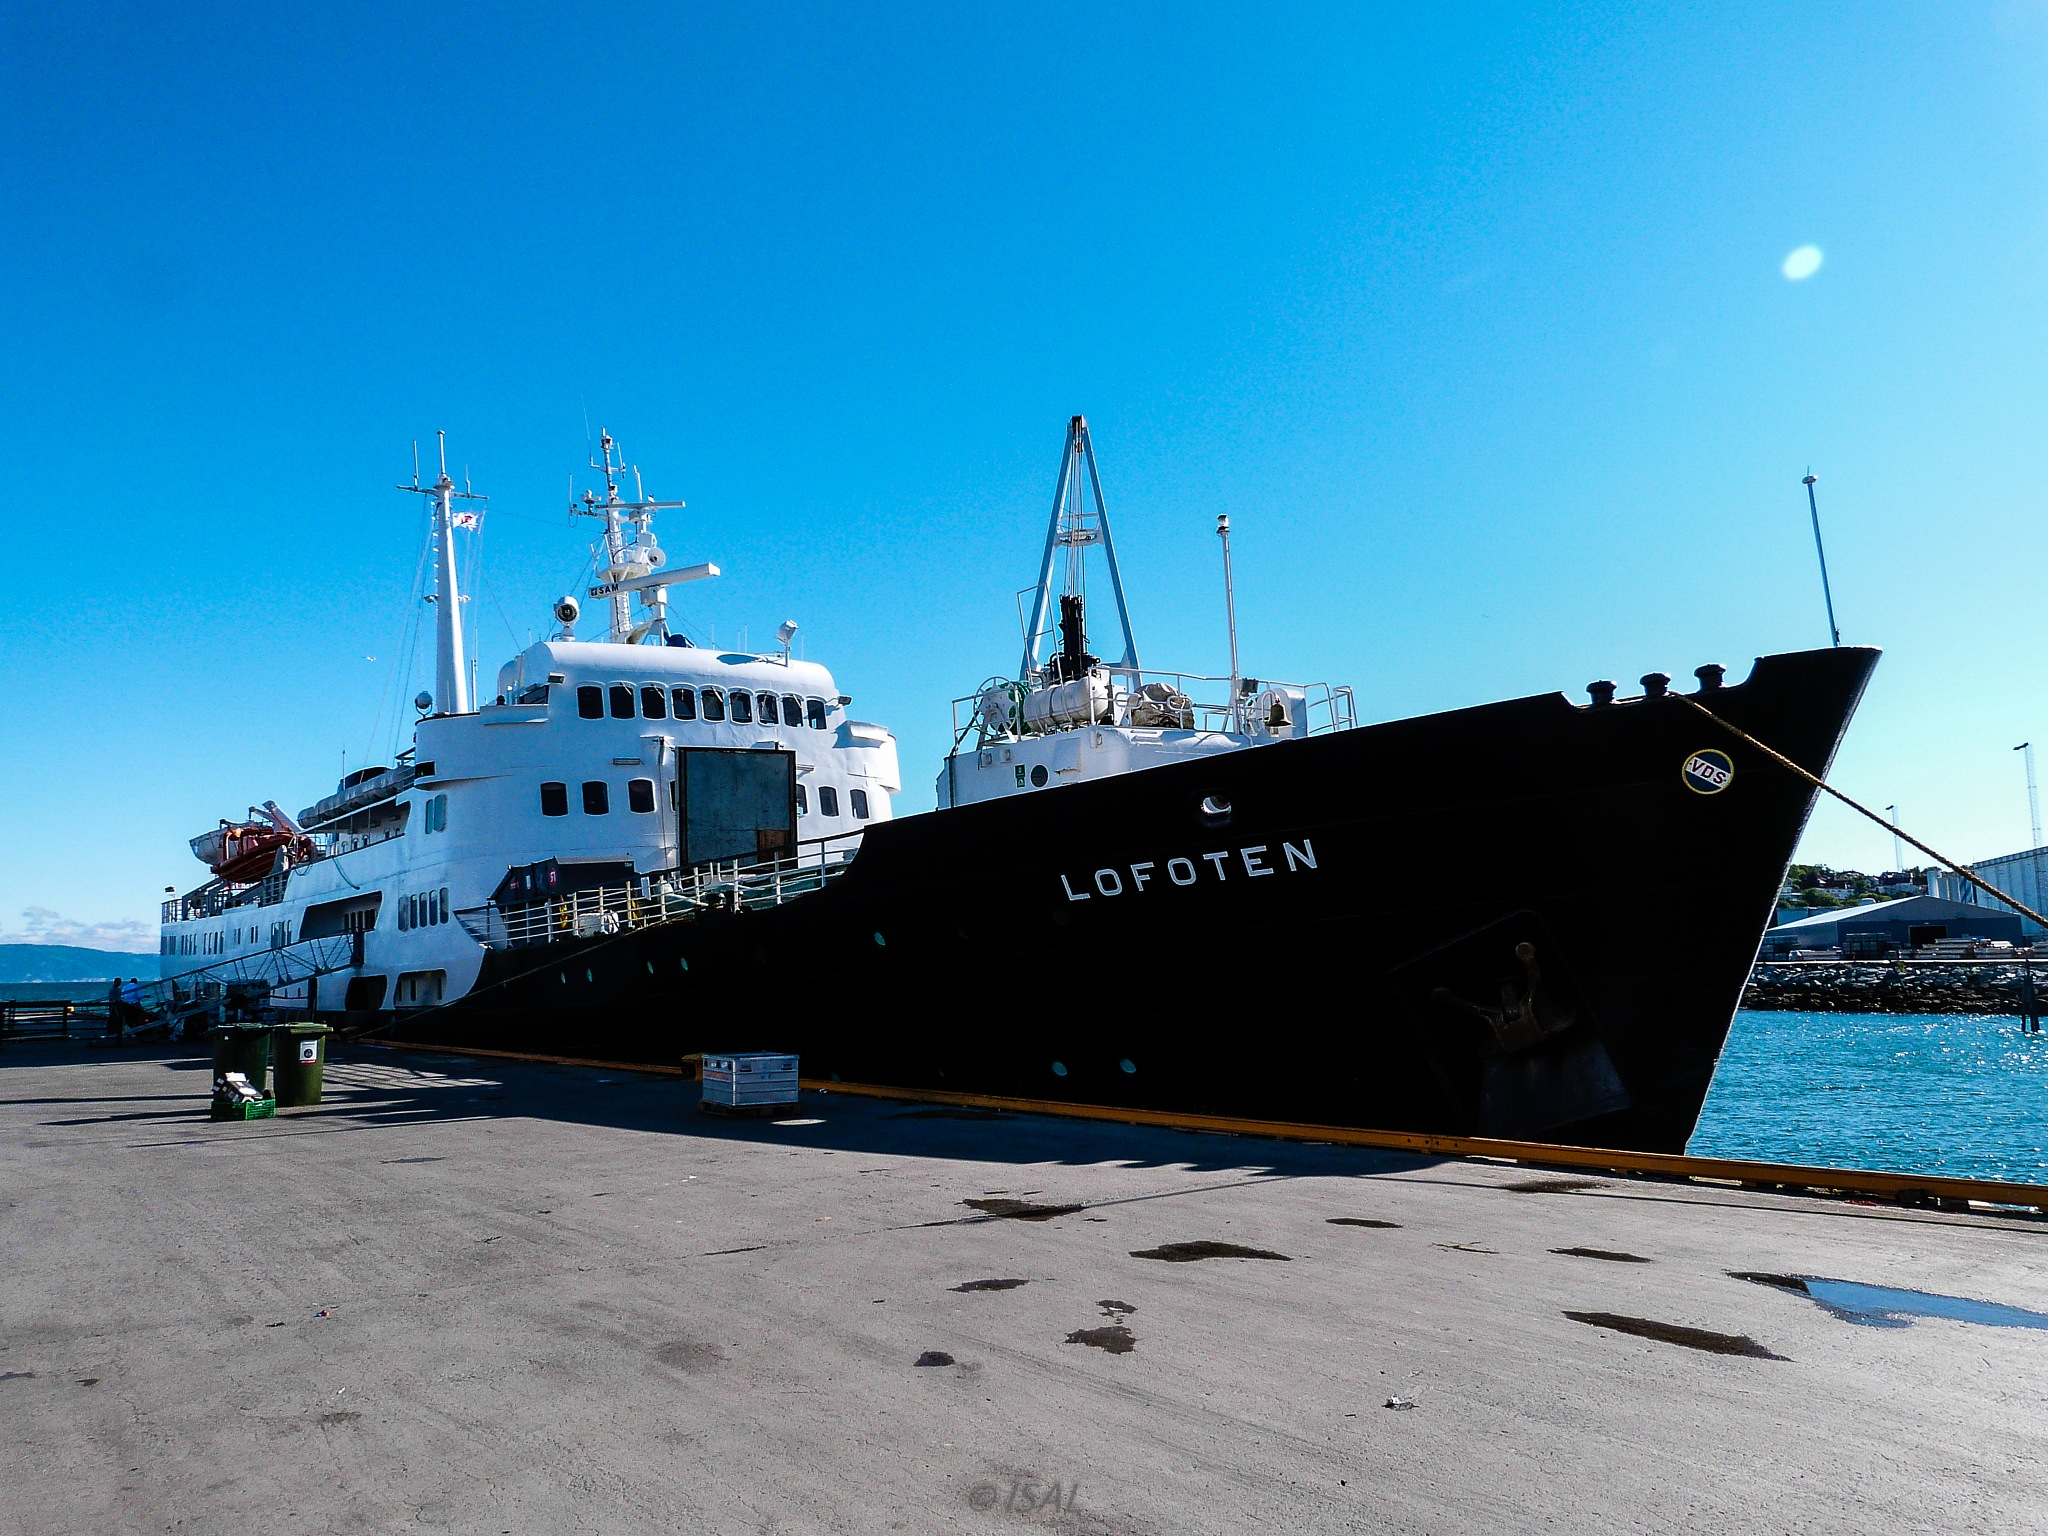 Ms Lofoten - Hurtigruten  by Aymée Lyrhe